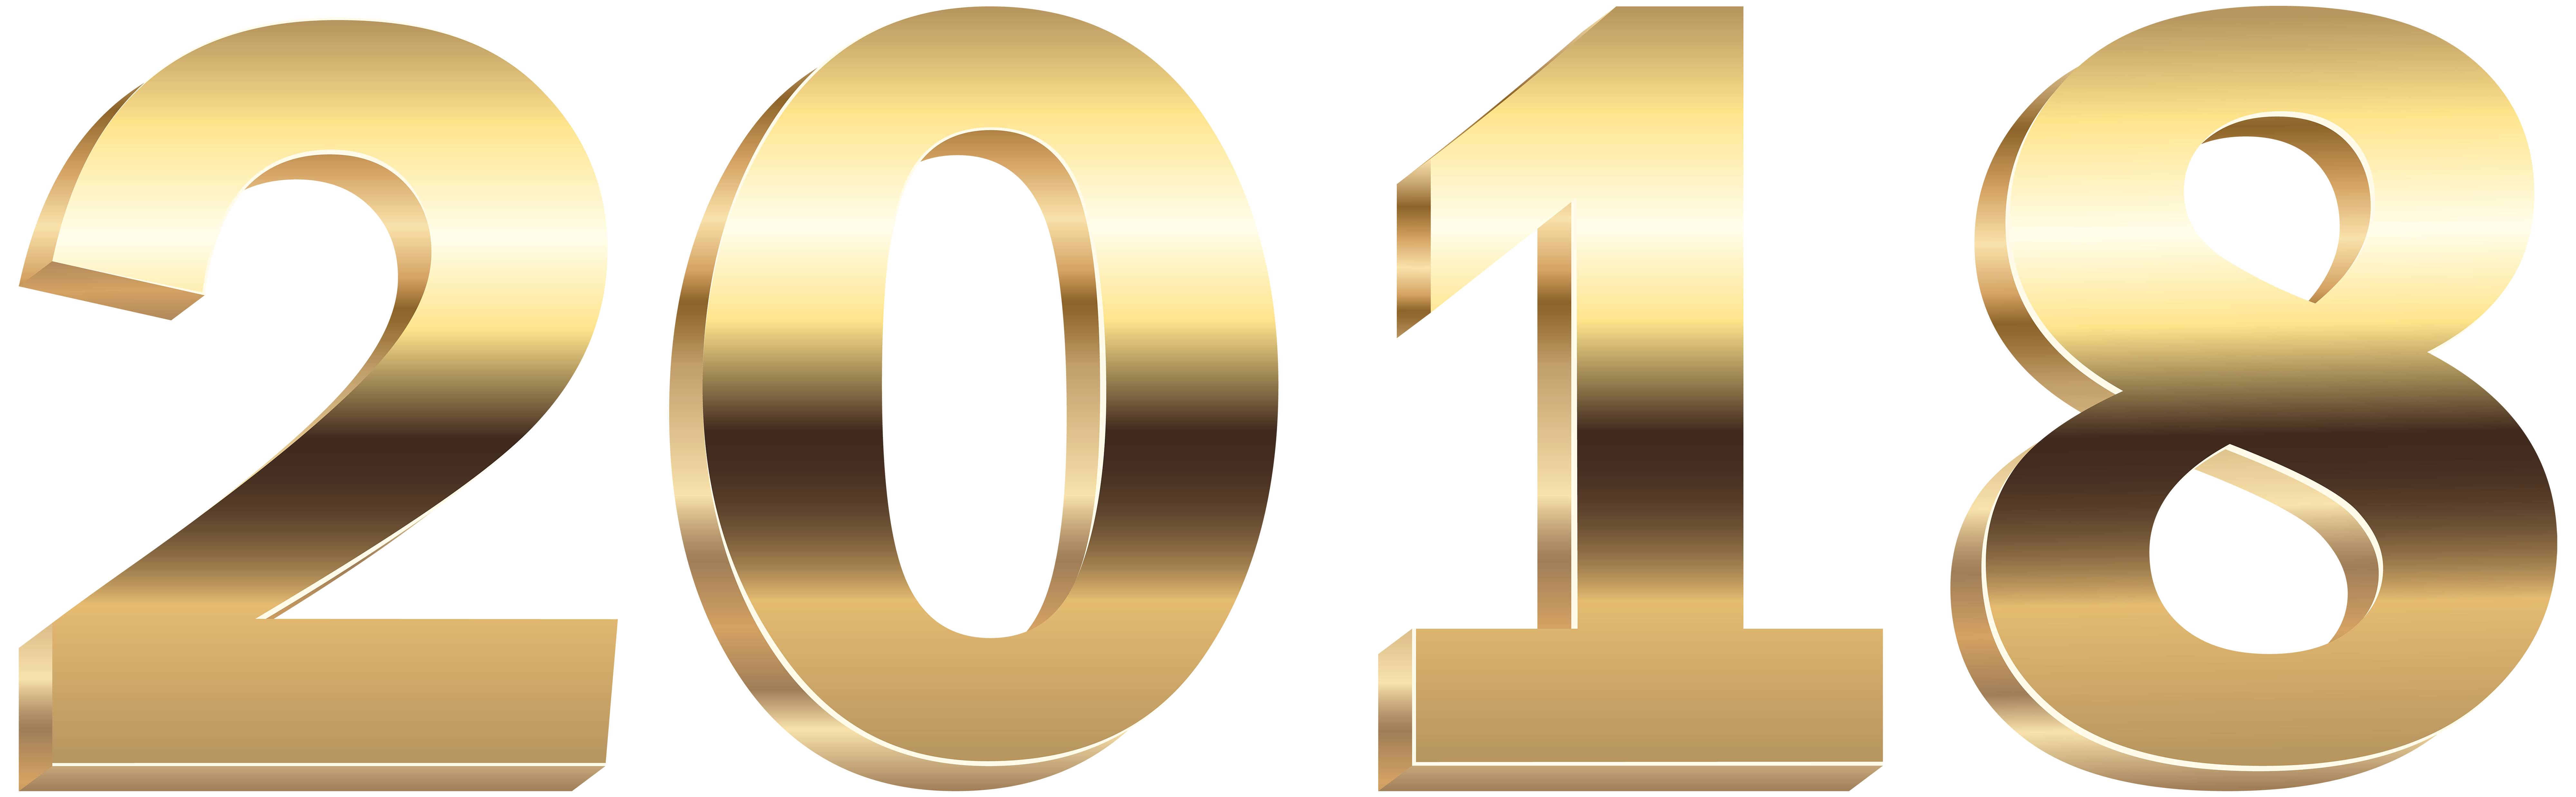 gold png clip. 2018 clipart logo